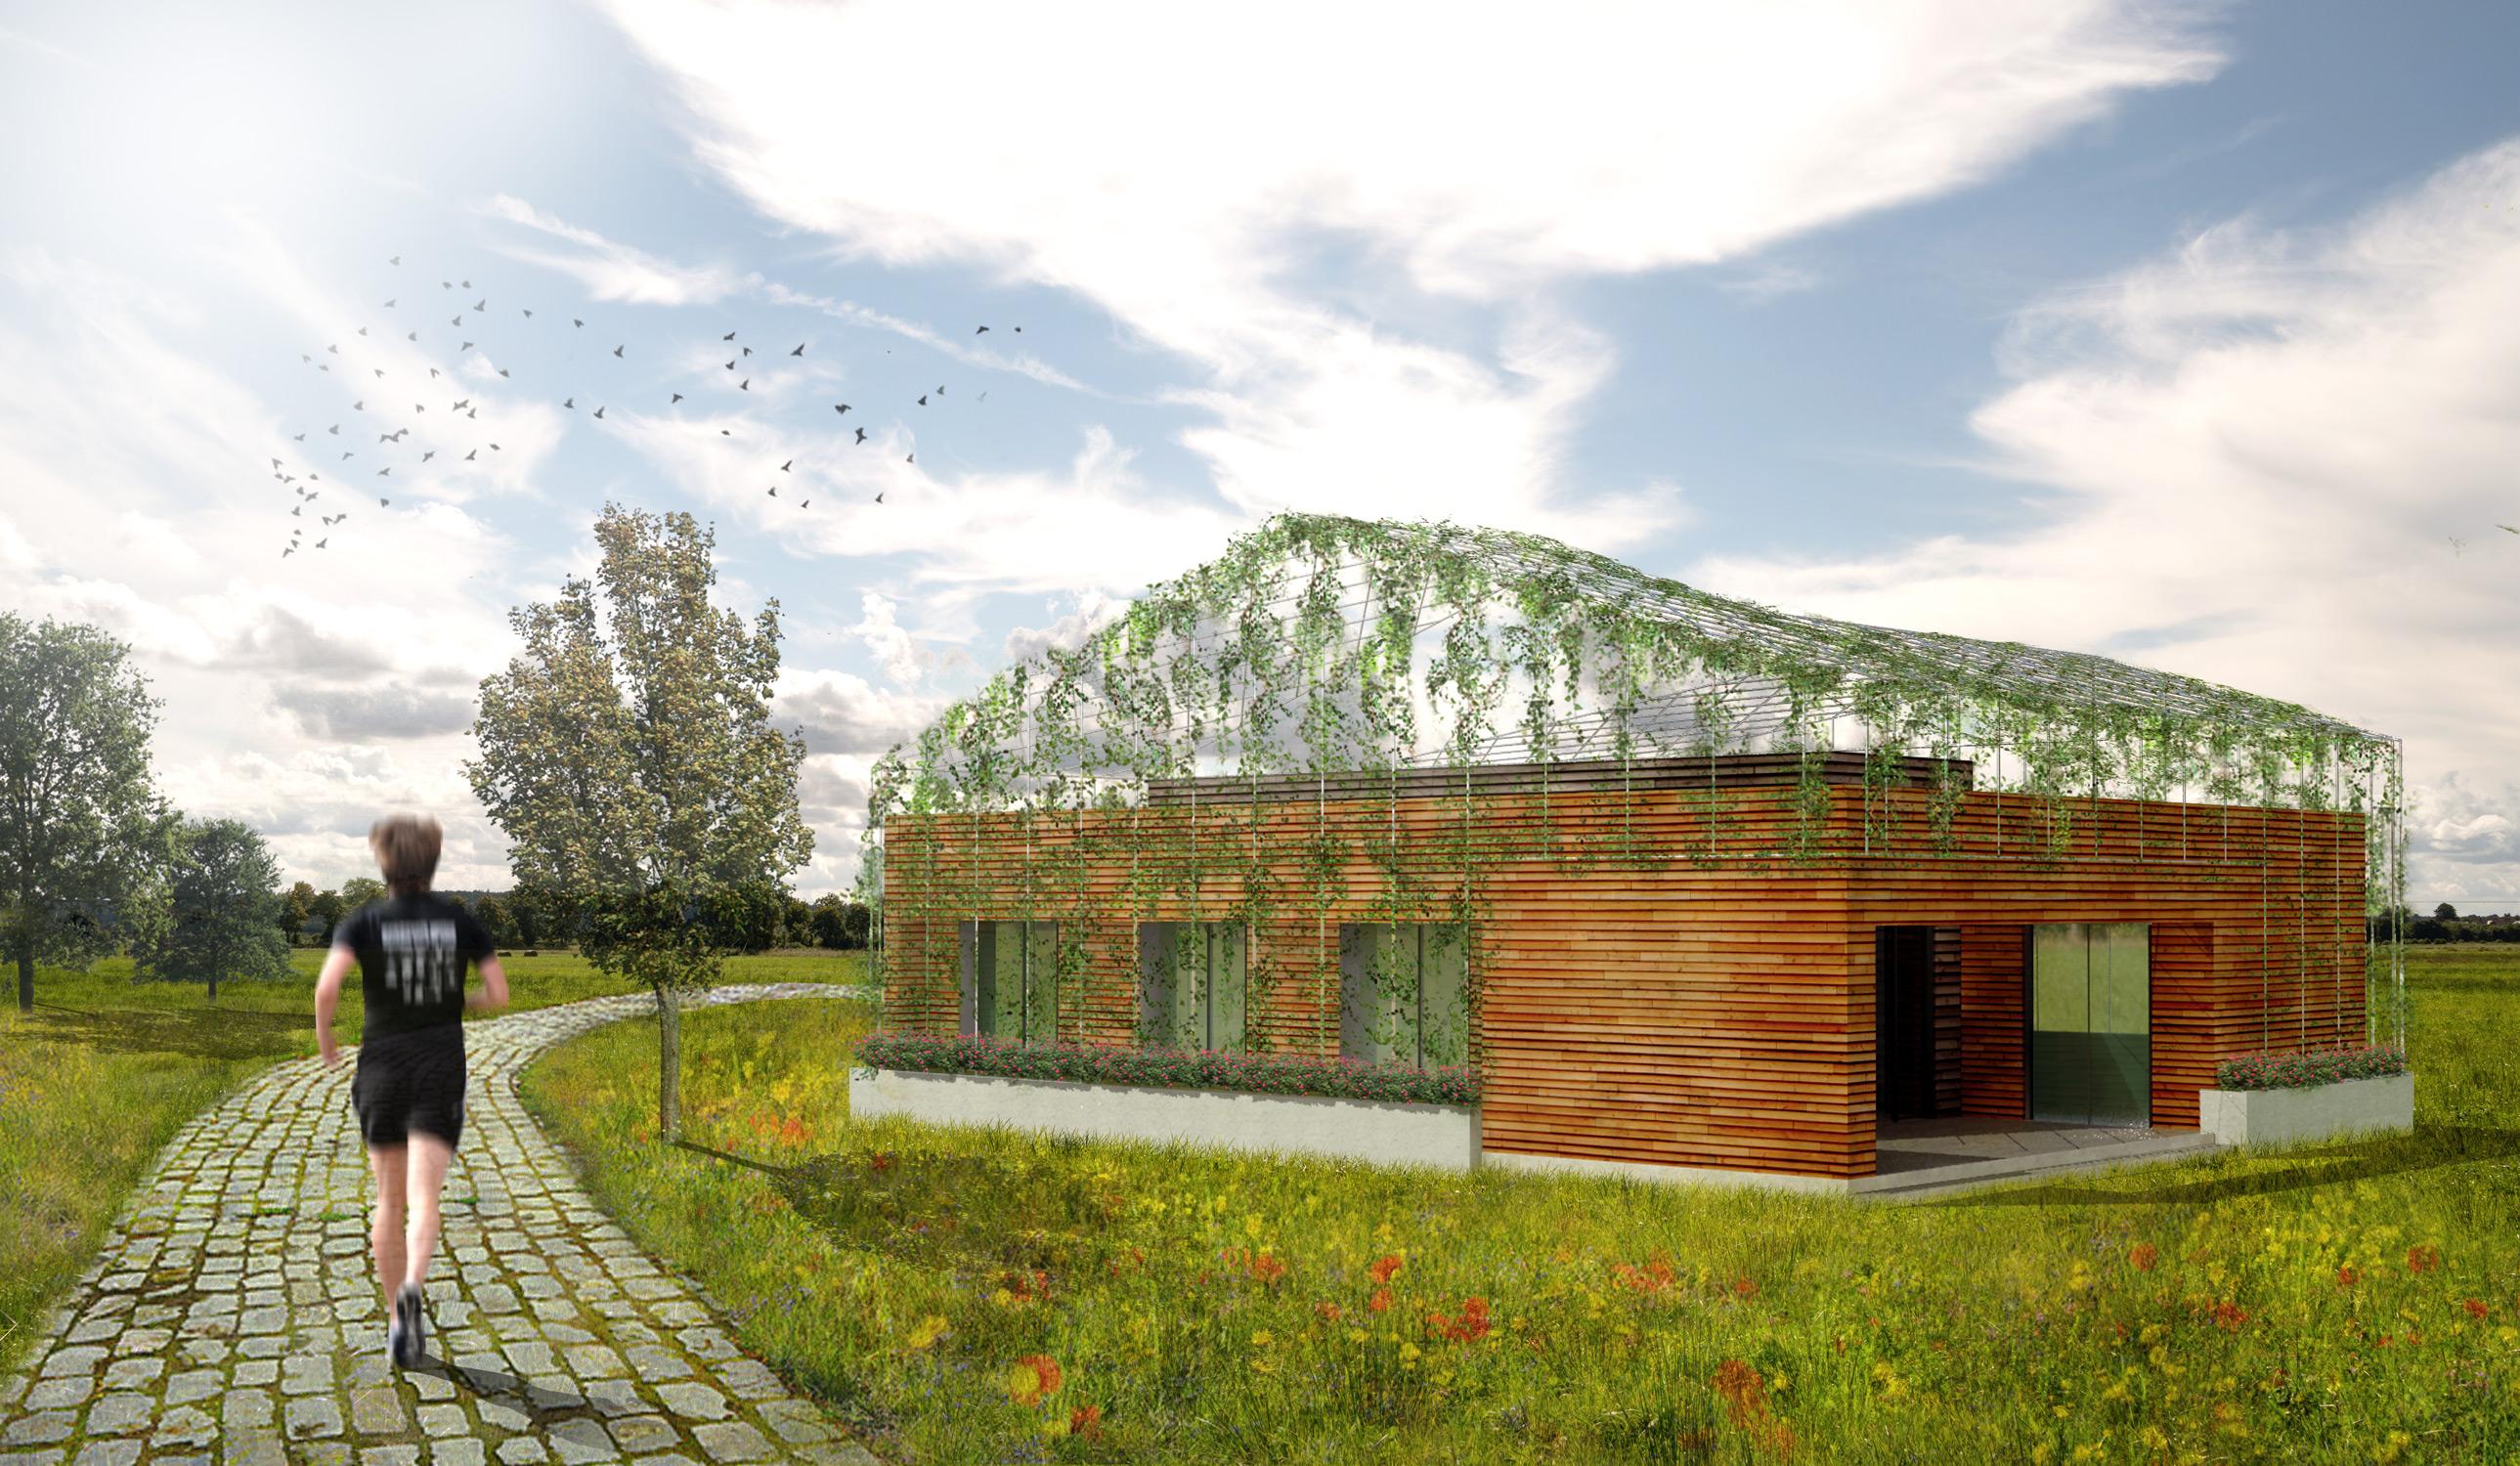 Casas ecol gicas precios idealista news - Casas ecologicas en espana ...